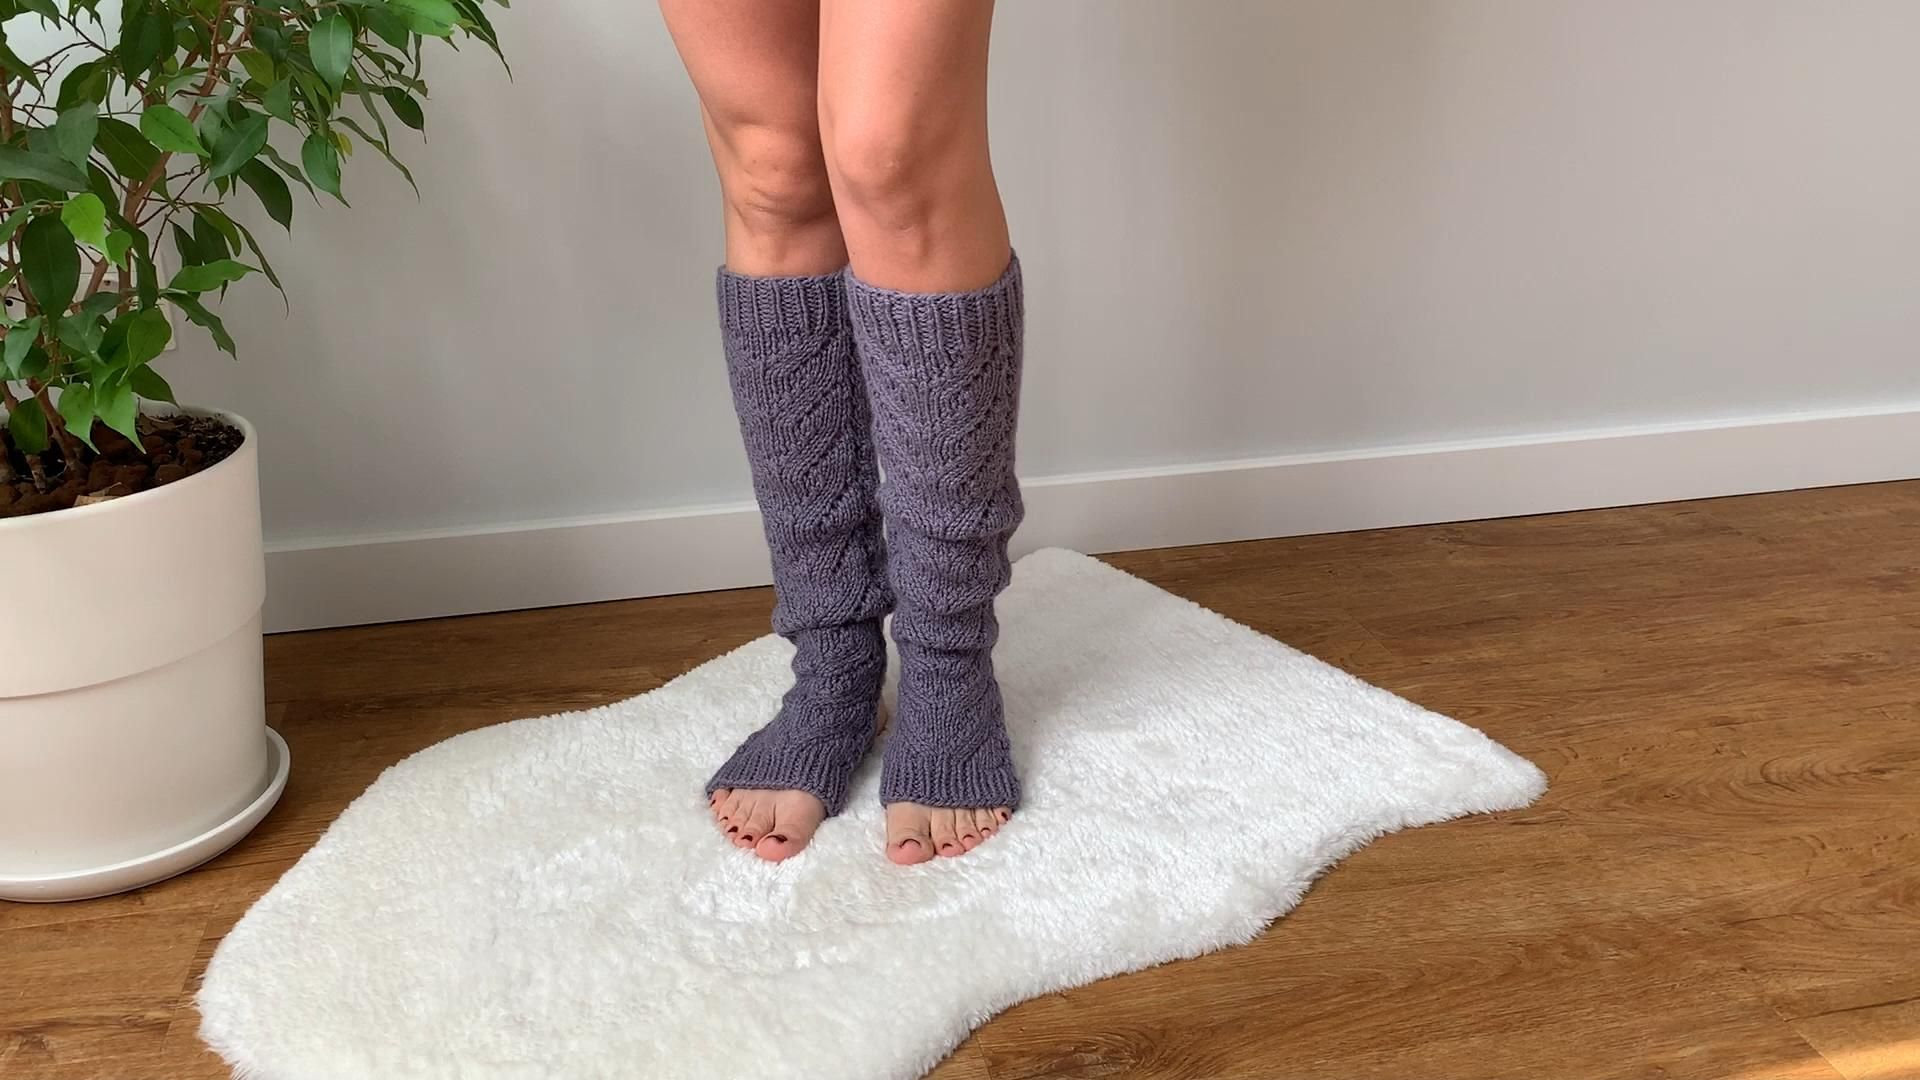 Yoga leg warmers Knitting Pattern Knitted socks Flip flop socks Thigh high socks